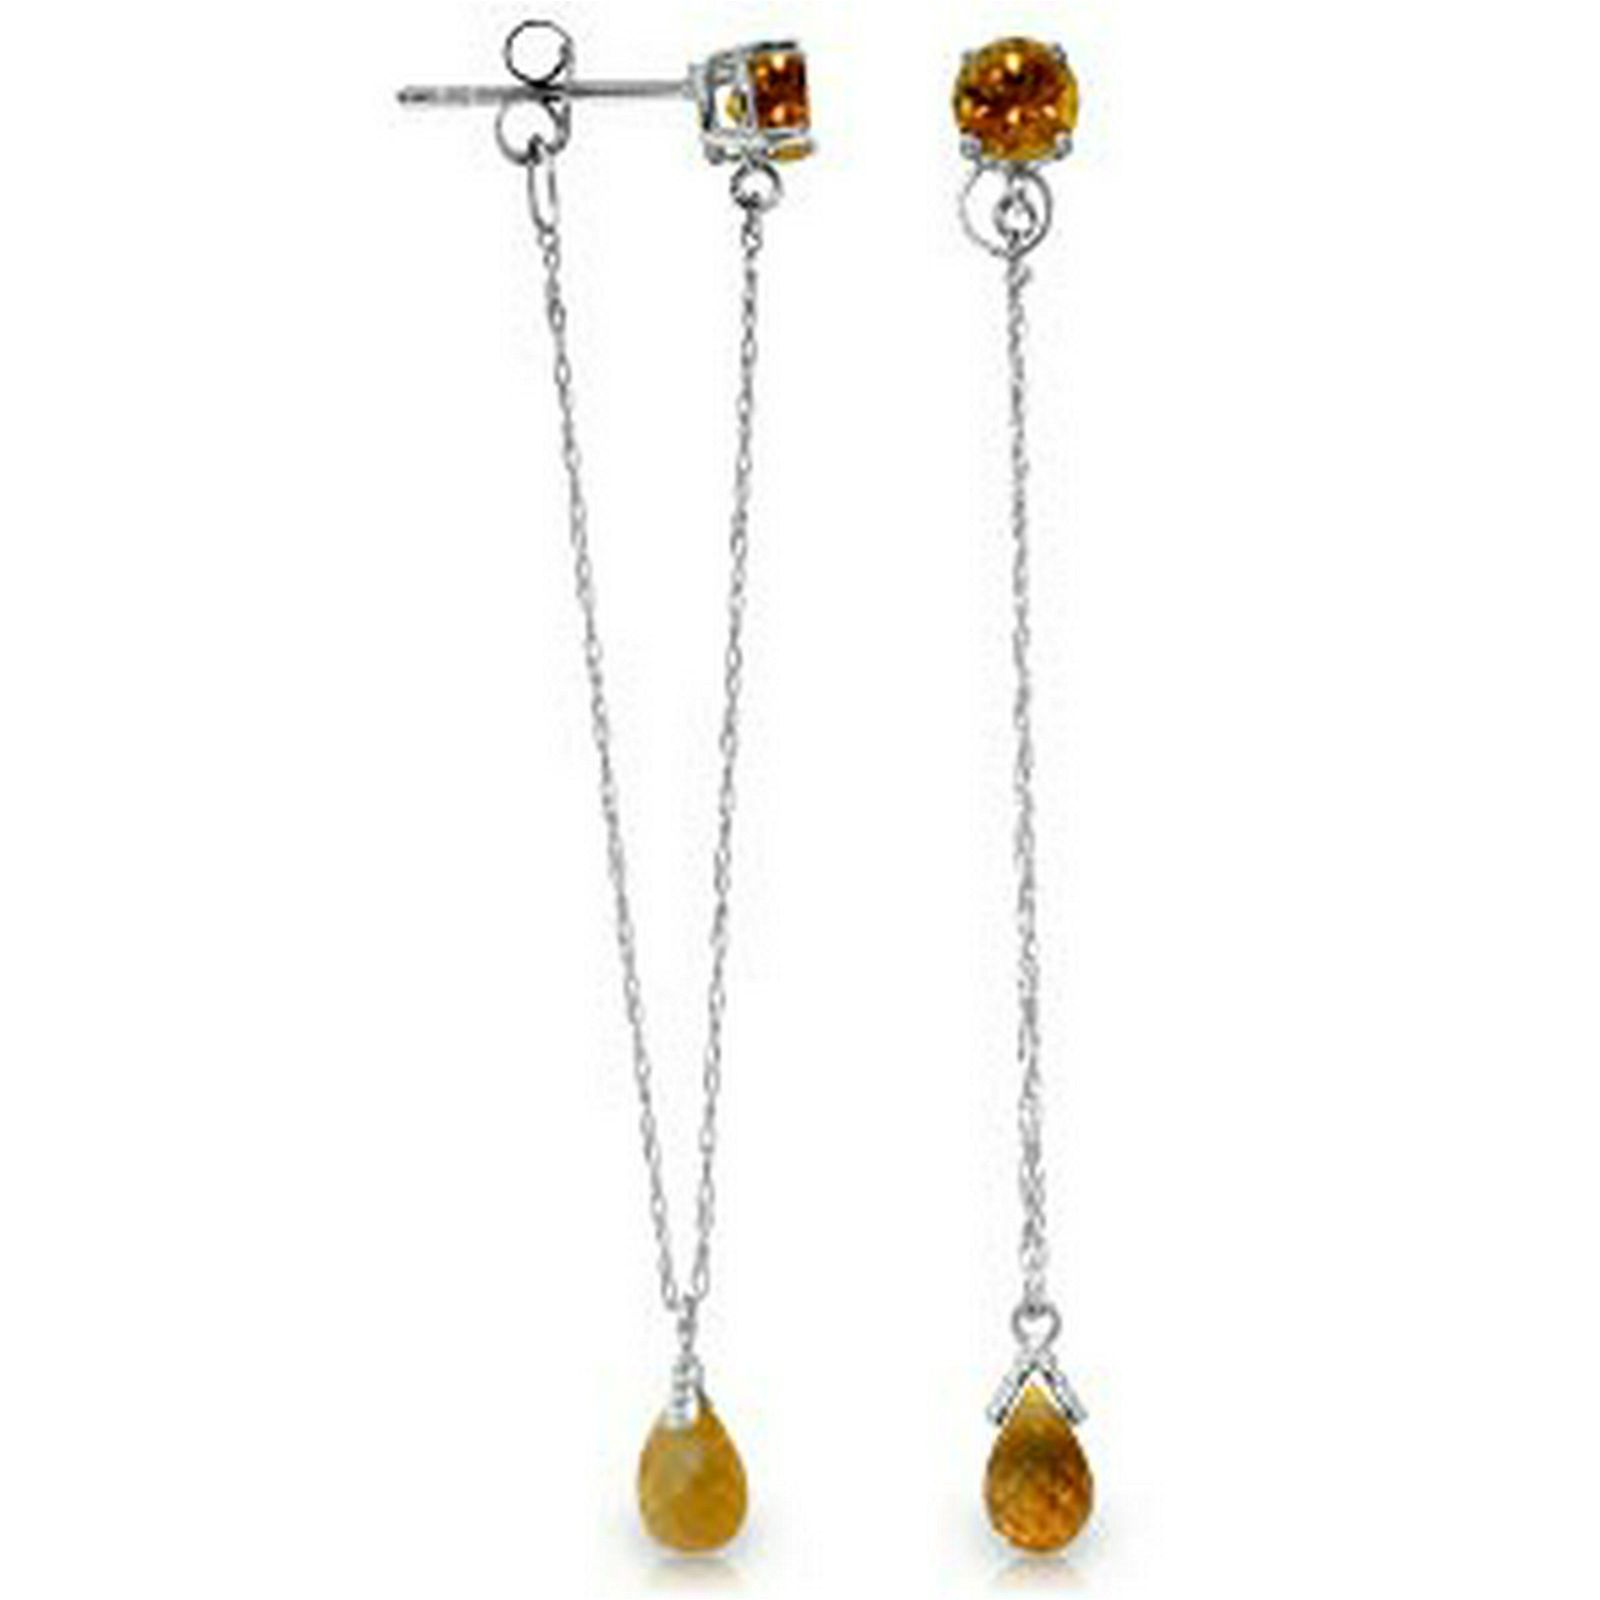 315 Carat 14K Solid White Gold Chandelier Earrings Cit